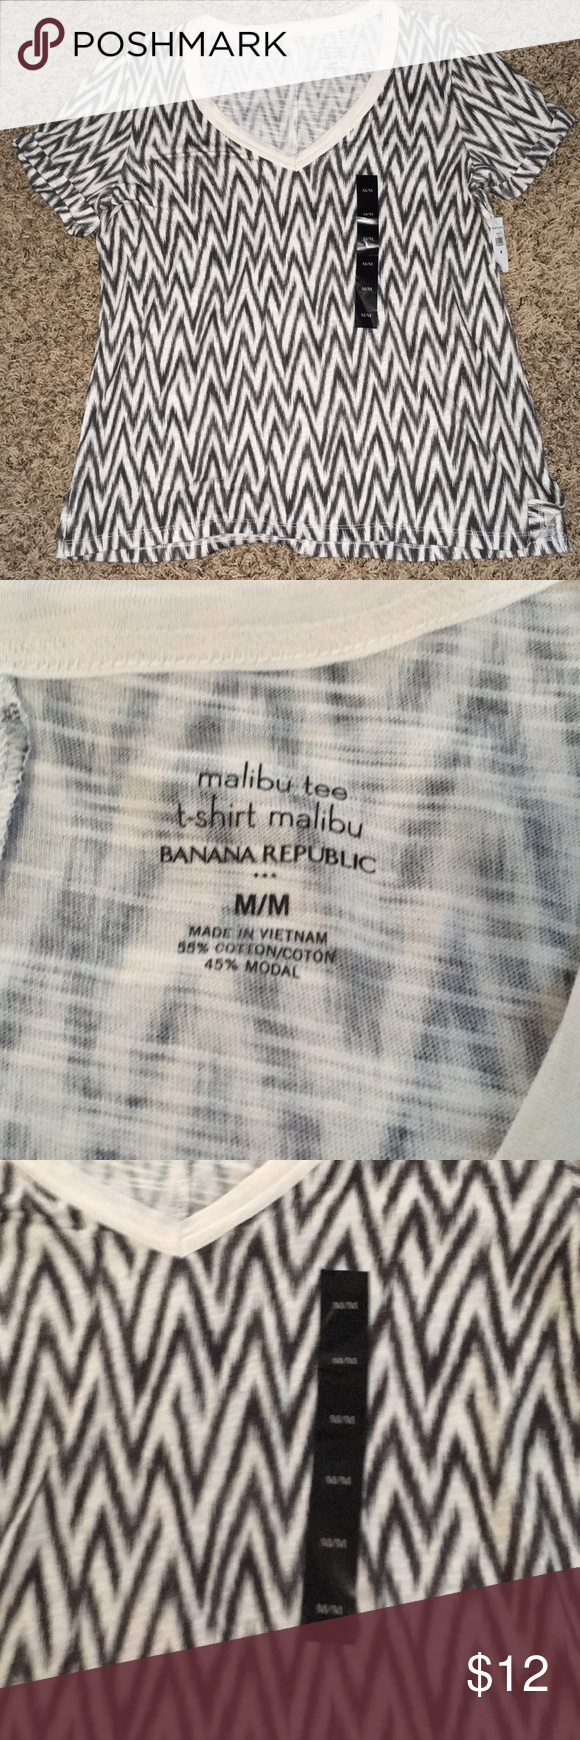 76a9e25d Banana Republic Malibu Tee chevron striped shirt Banana Republic chevron striped  shirt size M Banana Republic Tops Tees - Short Sleeve